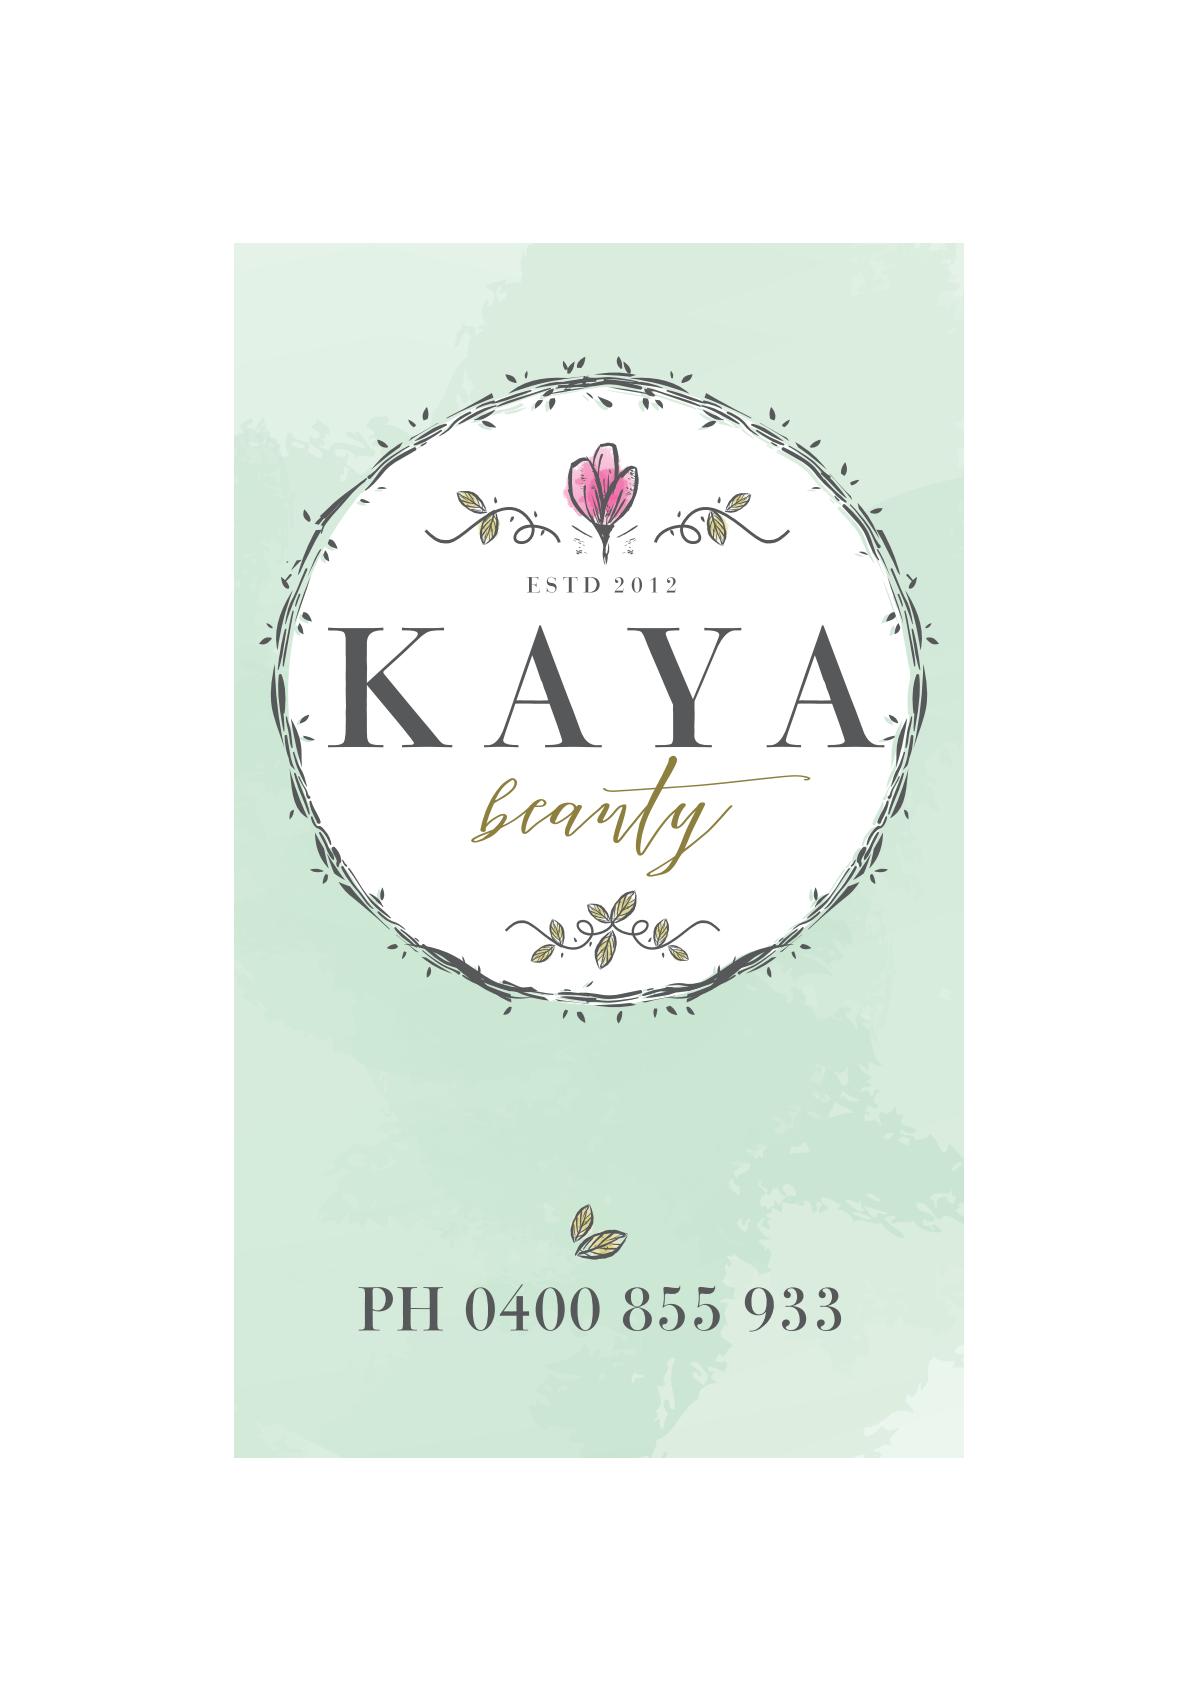 Kaya beauty salon